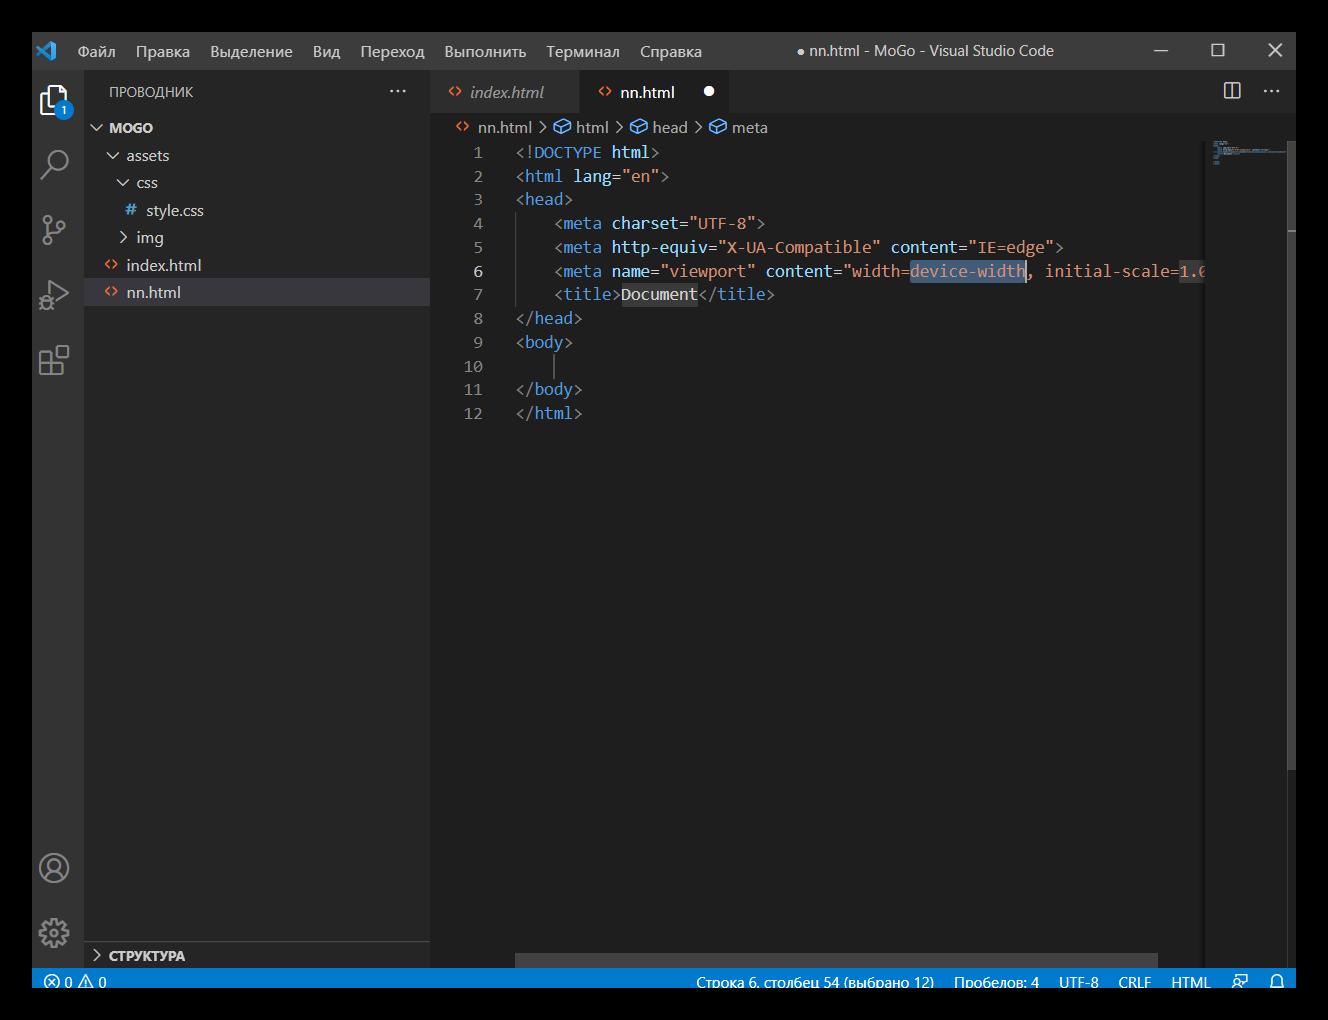 Развертка базовой структуры HTML-документа